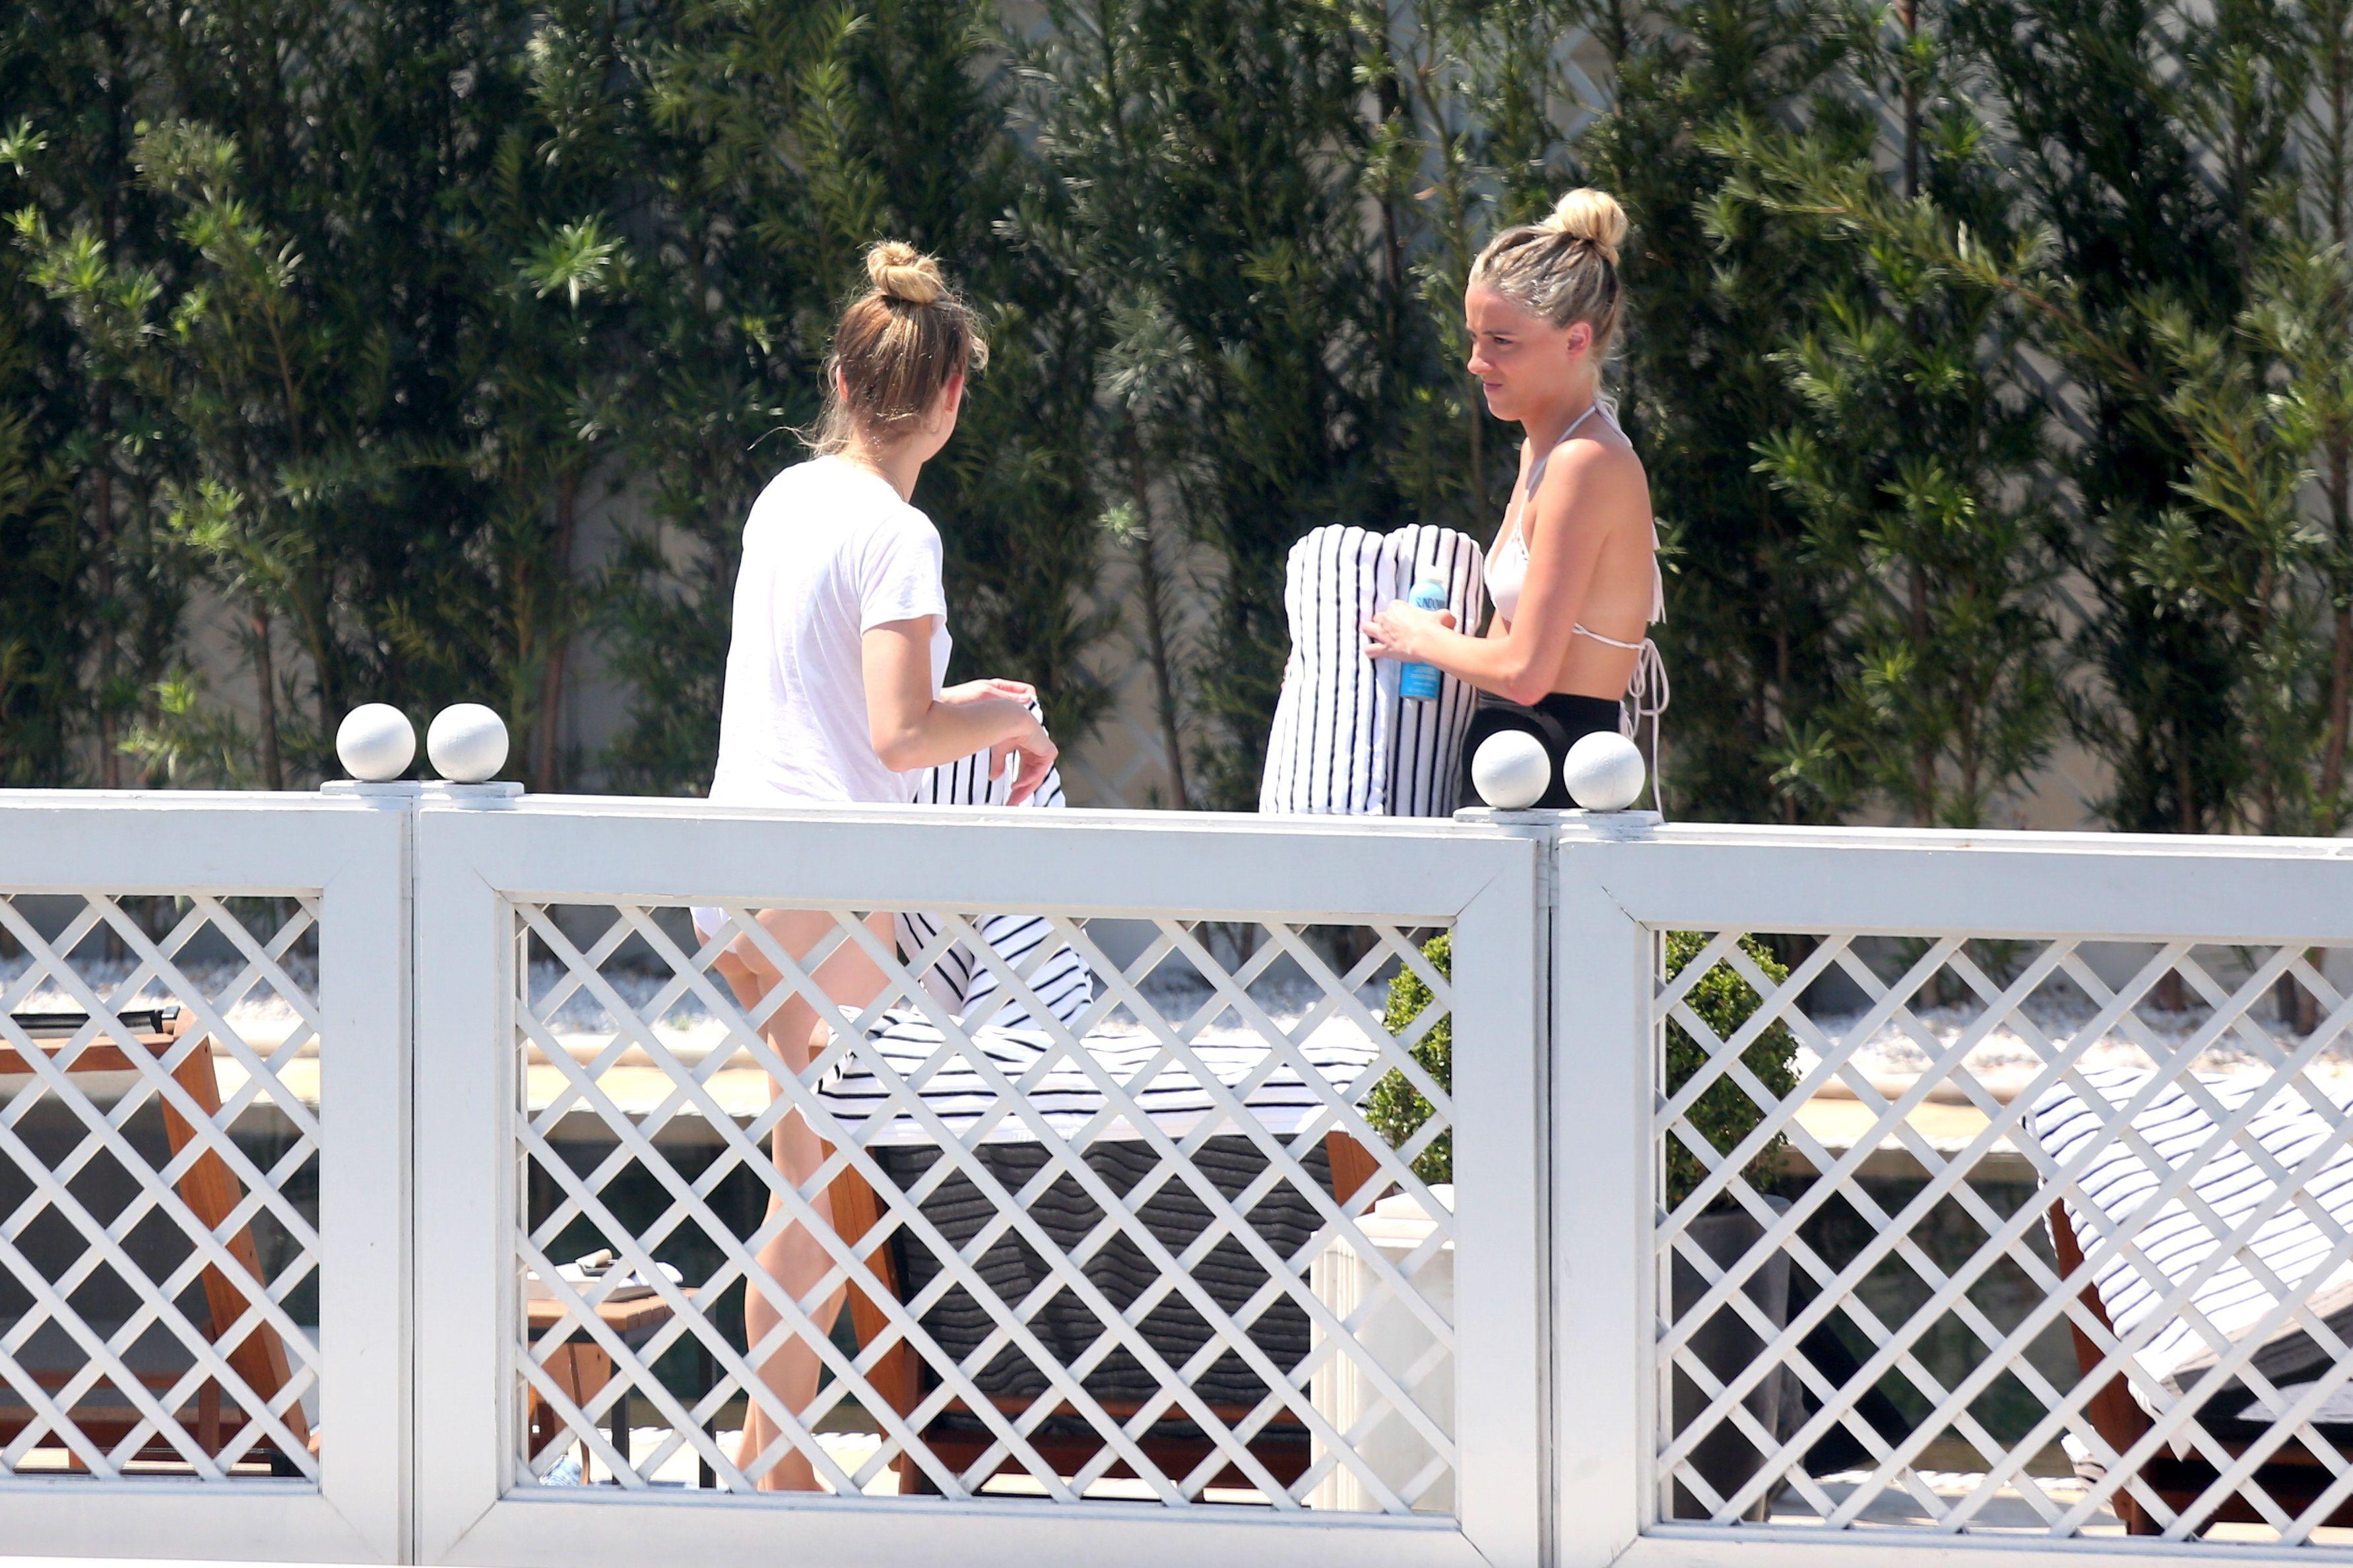 Amber Heard in a Bikini (31 Photos)